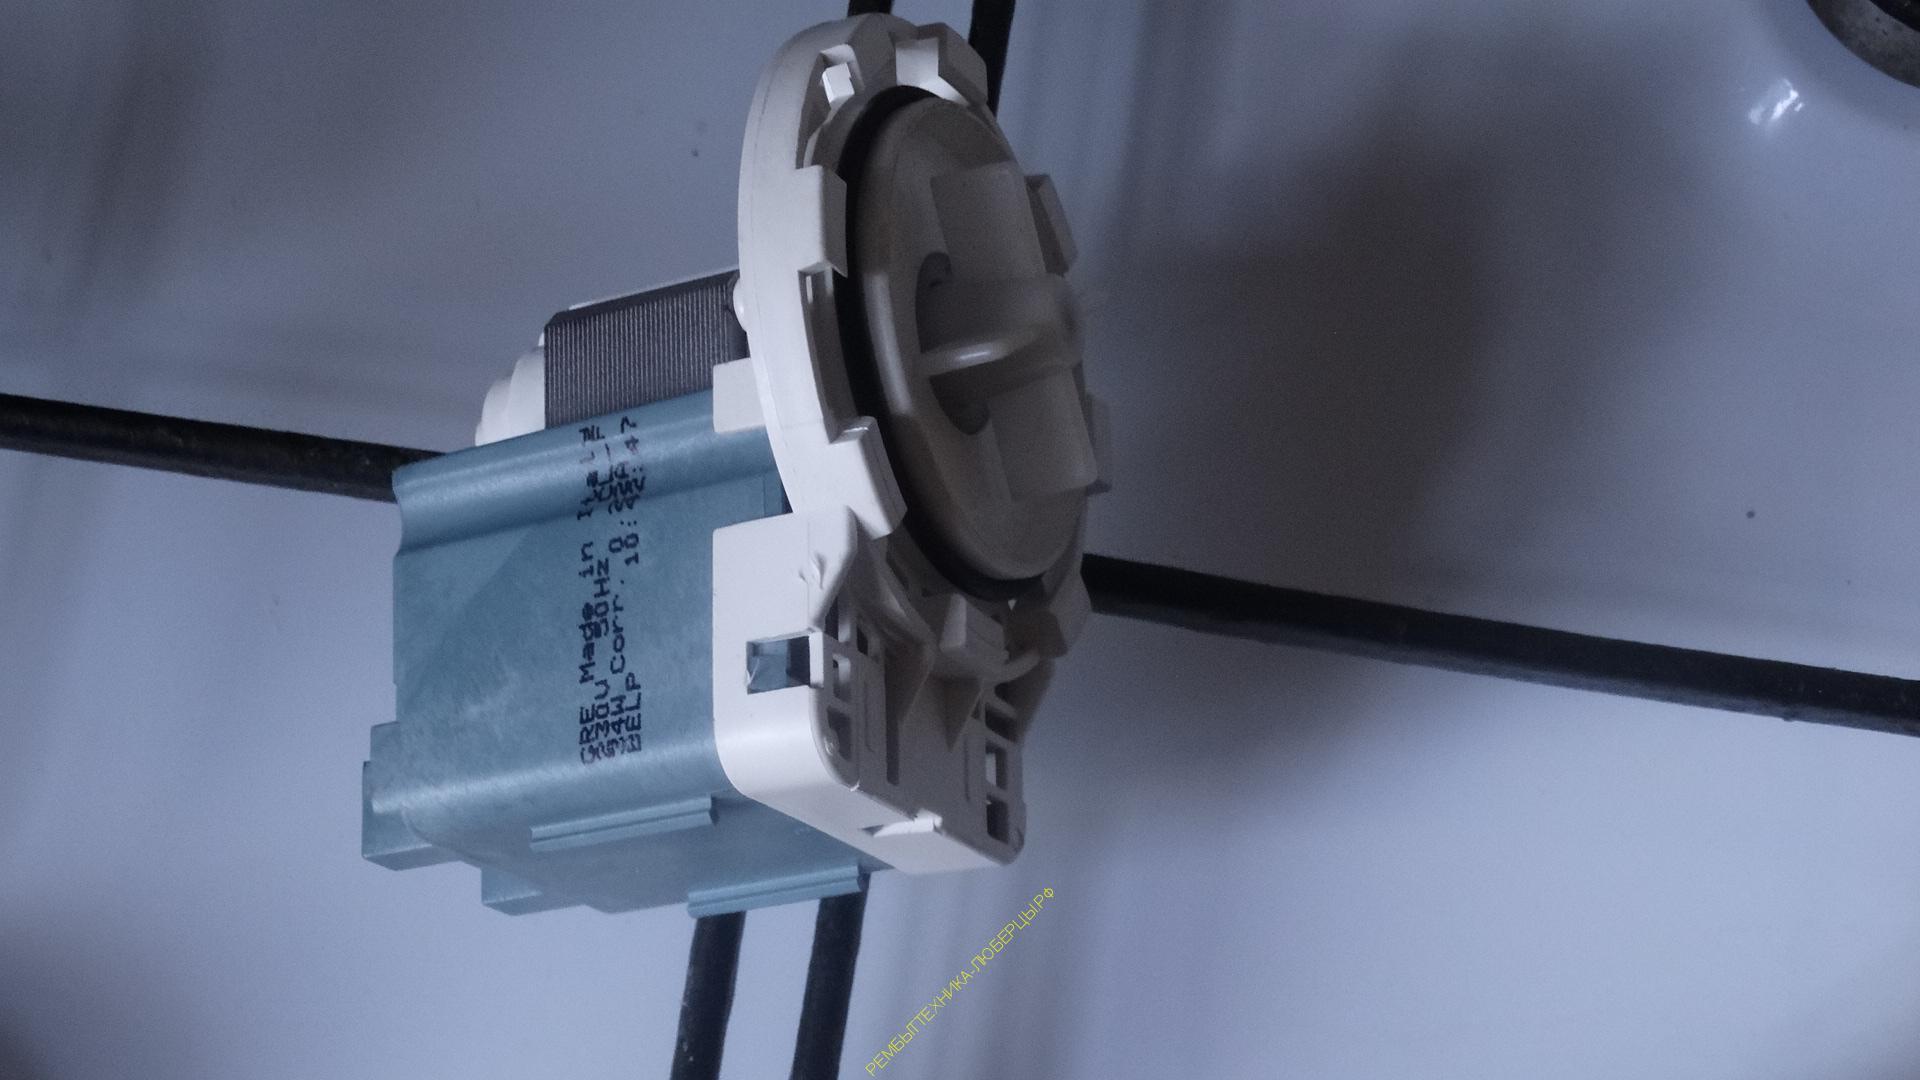 Hbc 86q650e bosch ремонт своими руками